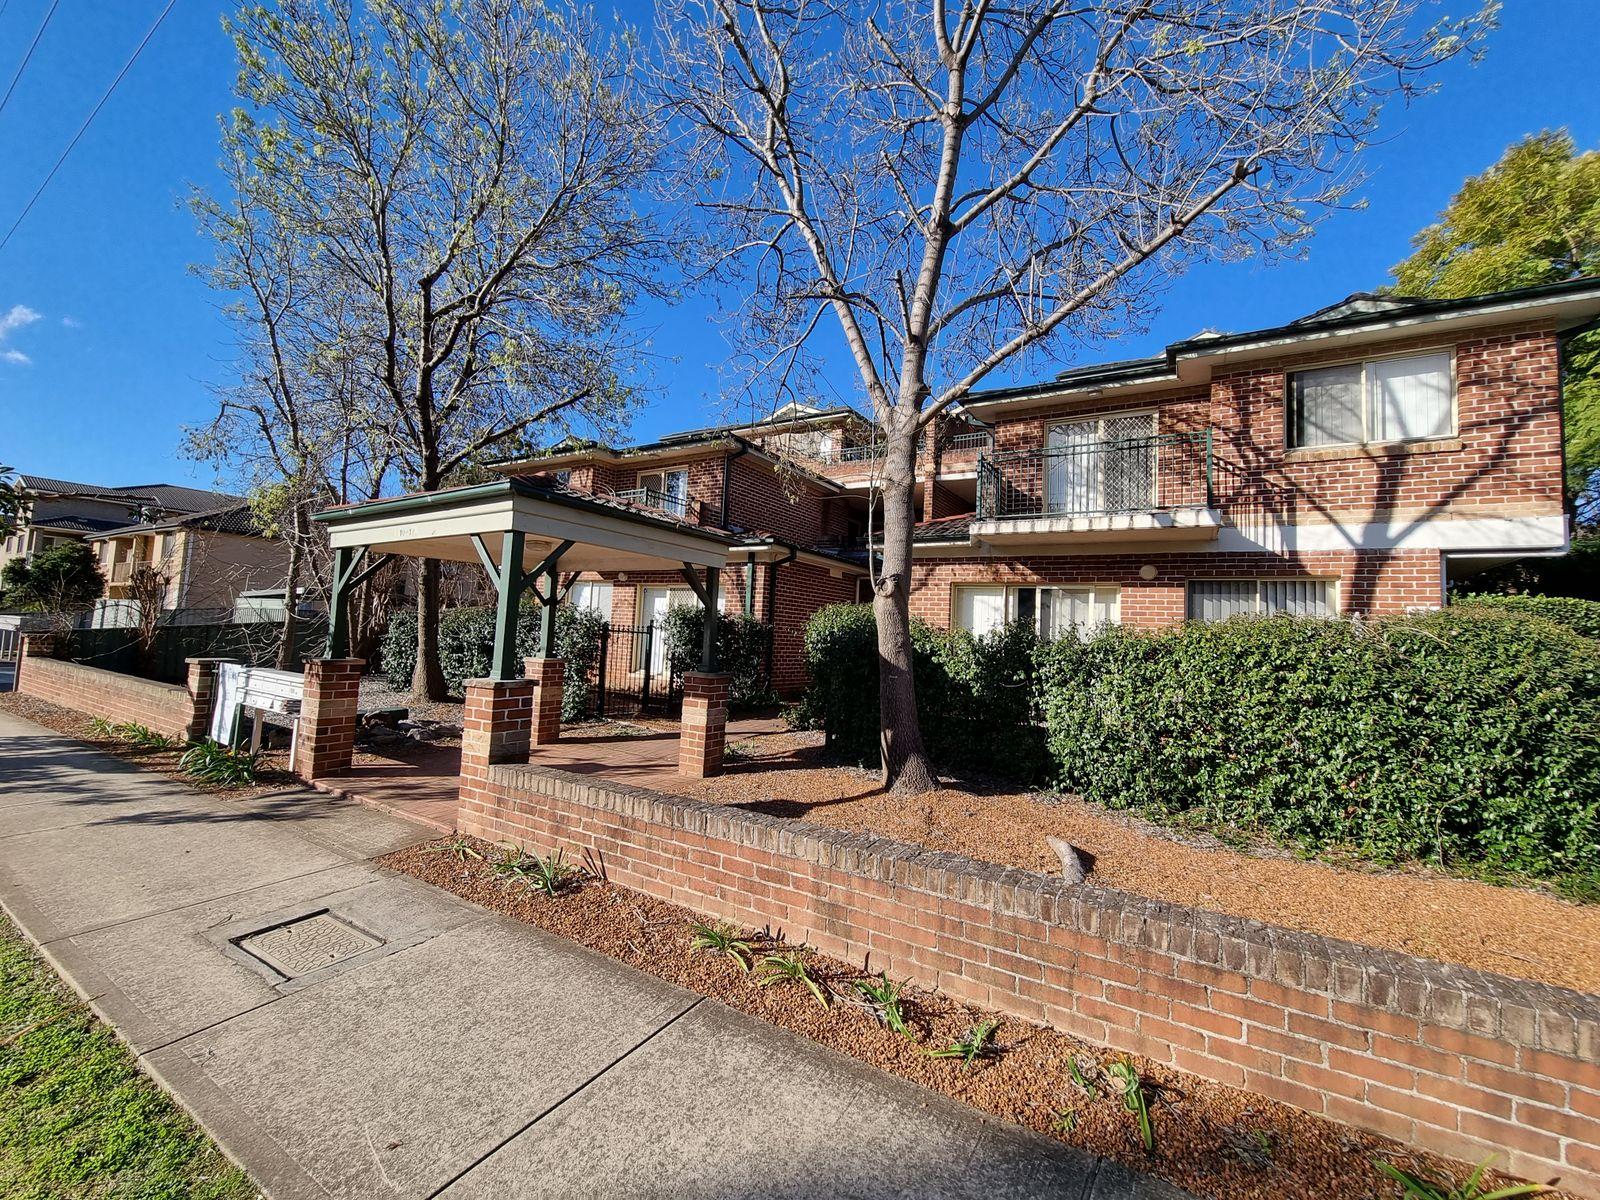 2/10 Dent Street, Penrith, NSW 2750